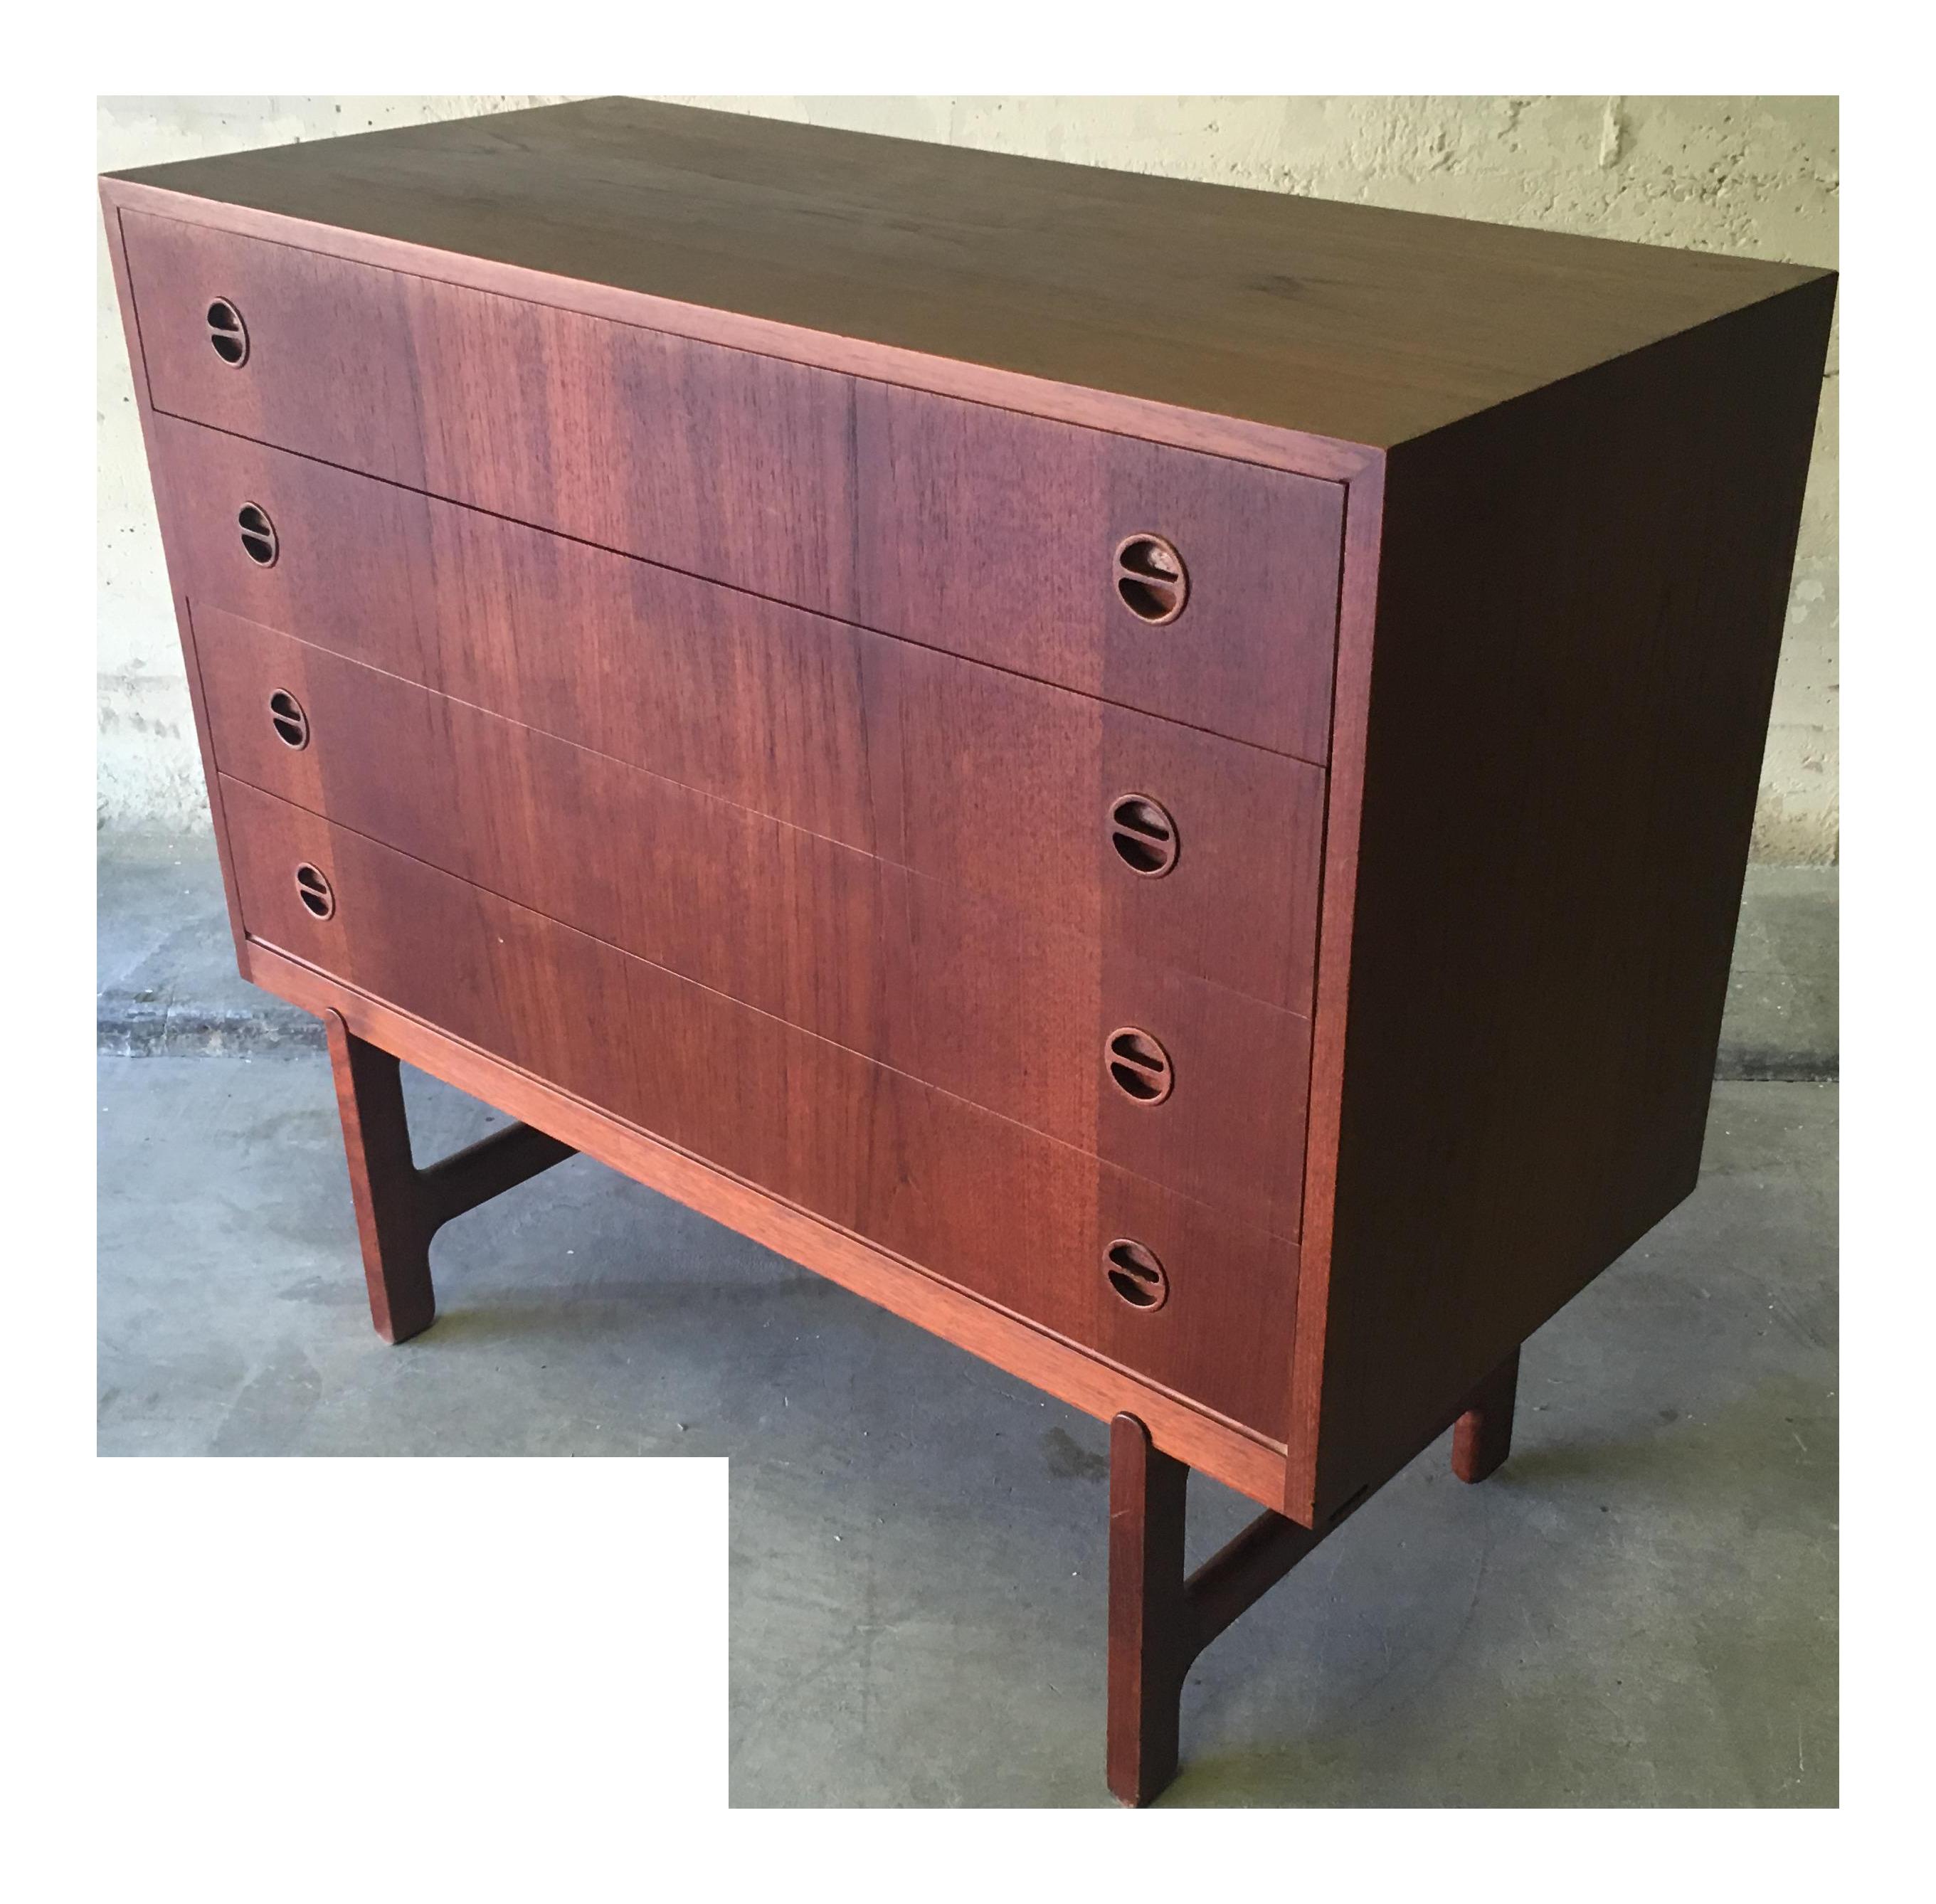 1960u0027s ejnar larsen u0026 askel madsen for nm denmark chest of drawers